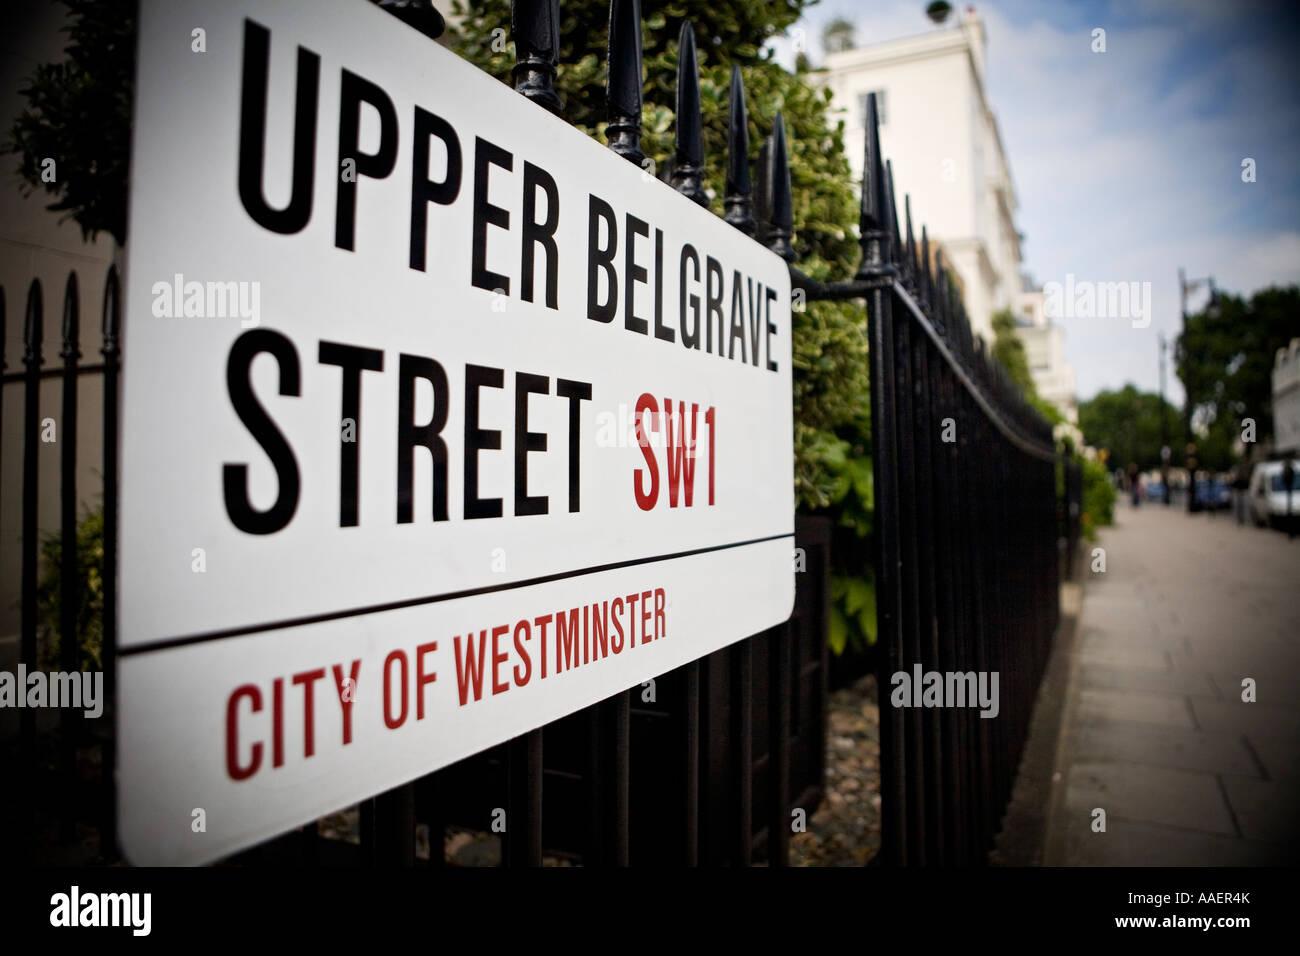 Upper Belgrave Belgravia exclusive area of London SW1 - Stock Image